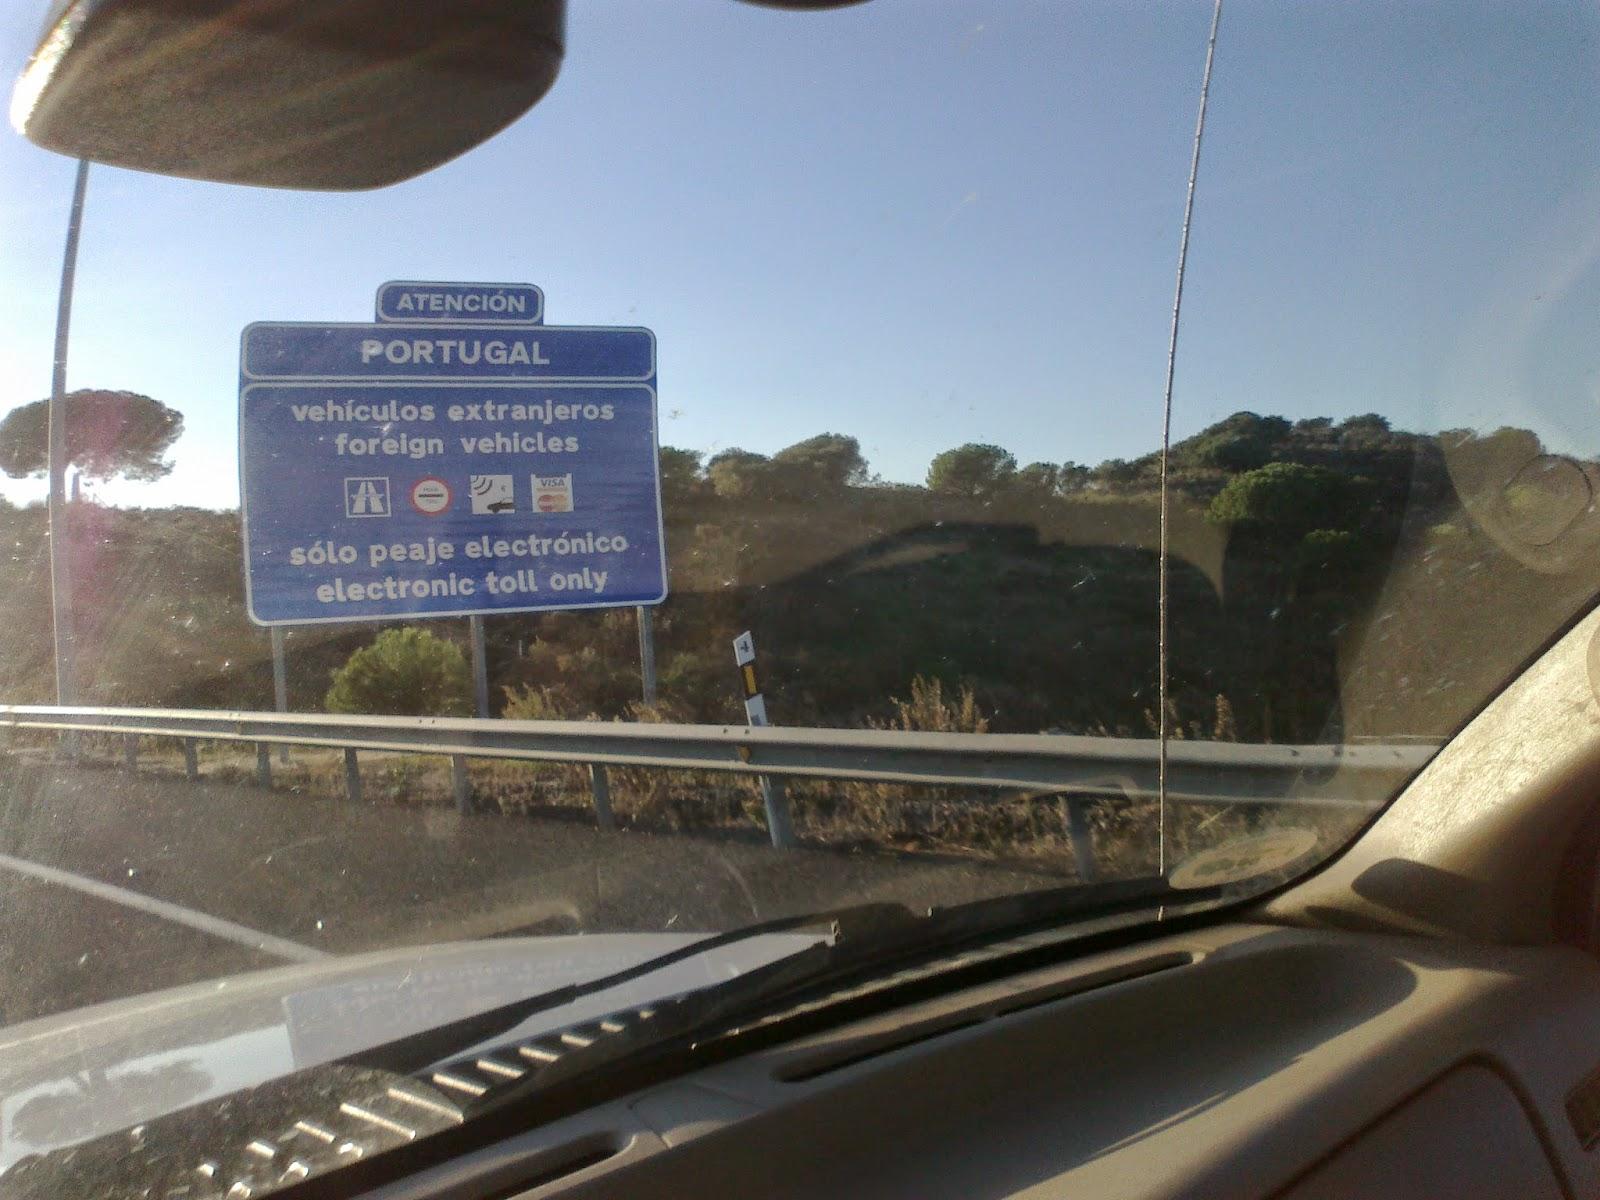 5th wheel transport, Portugal, France, Spain